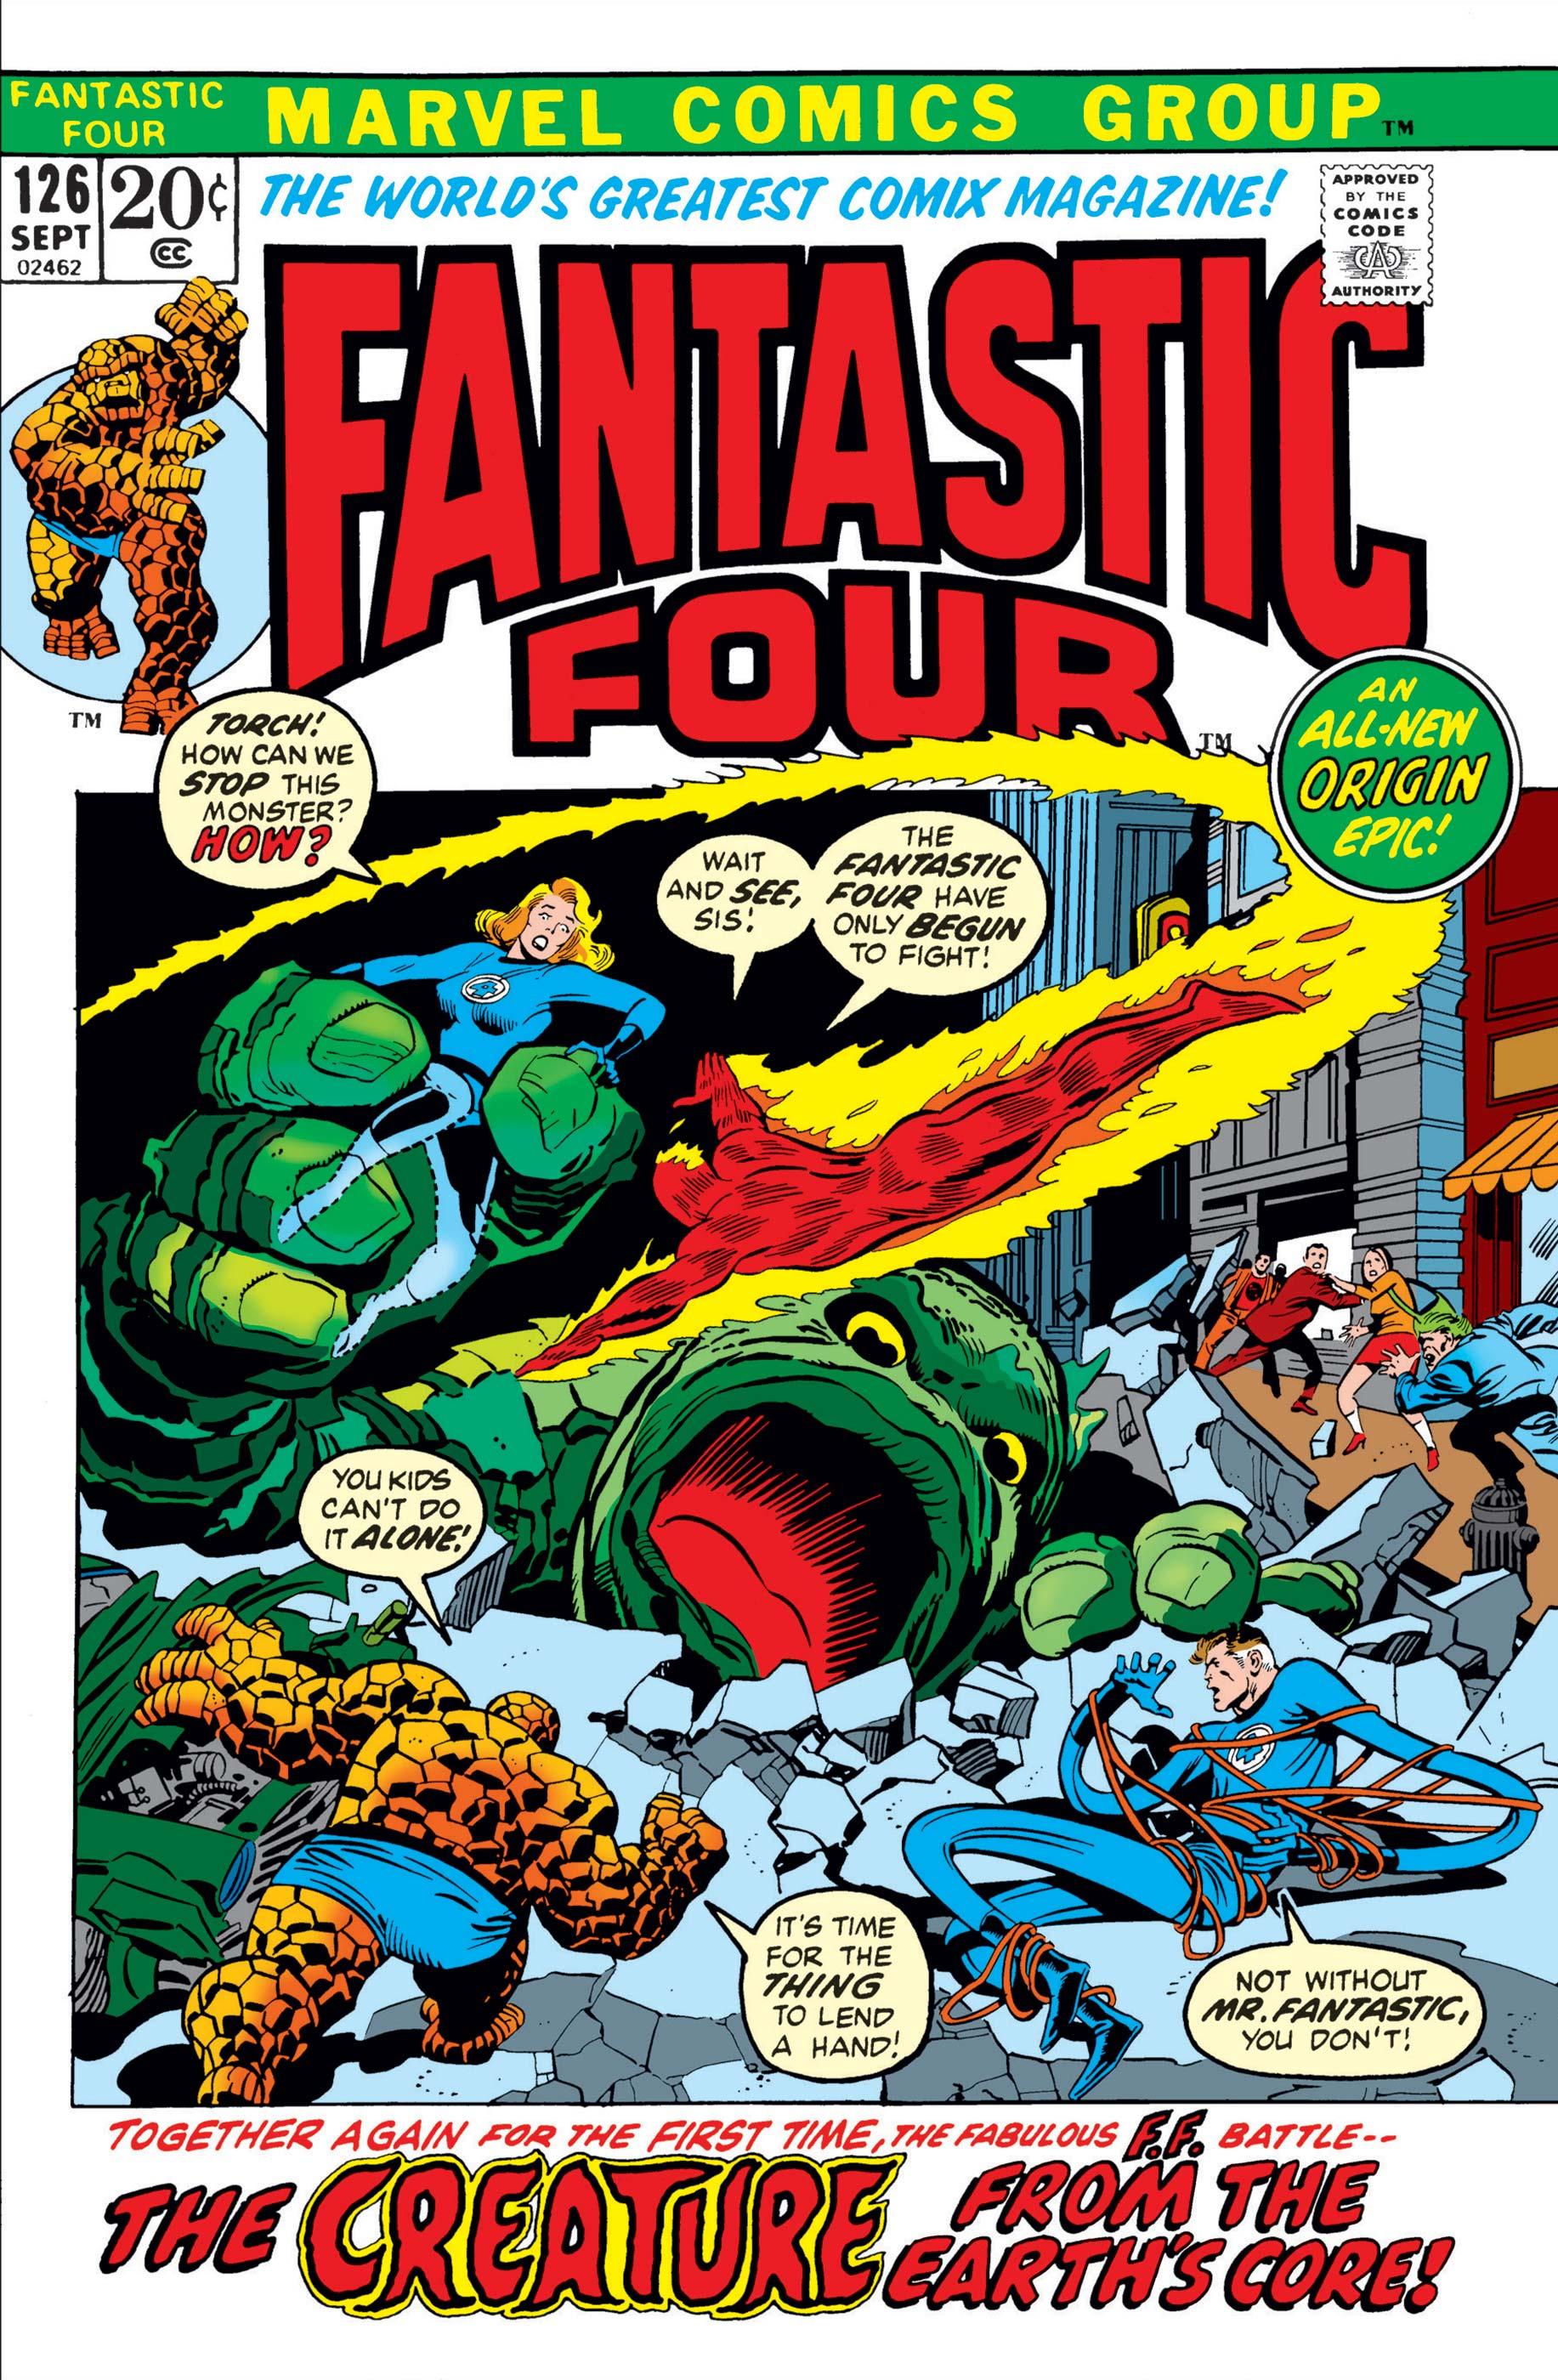 Fantastic Four (1961) #126